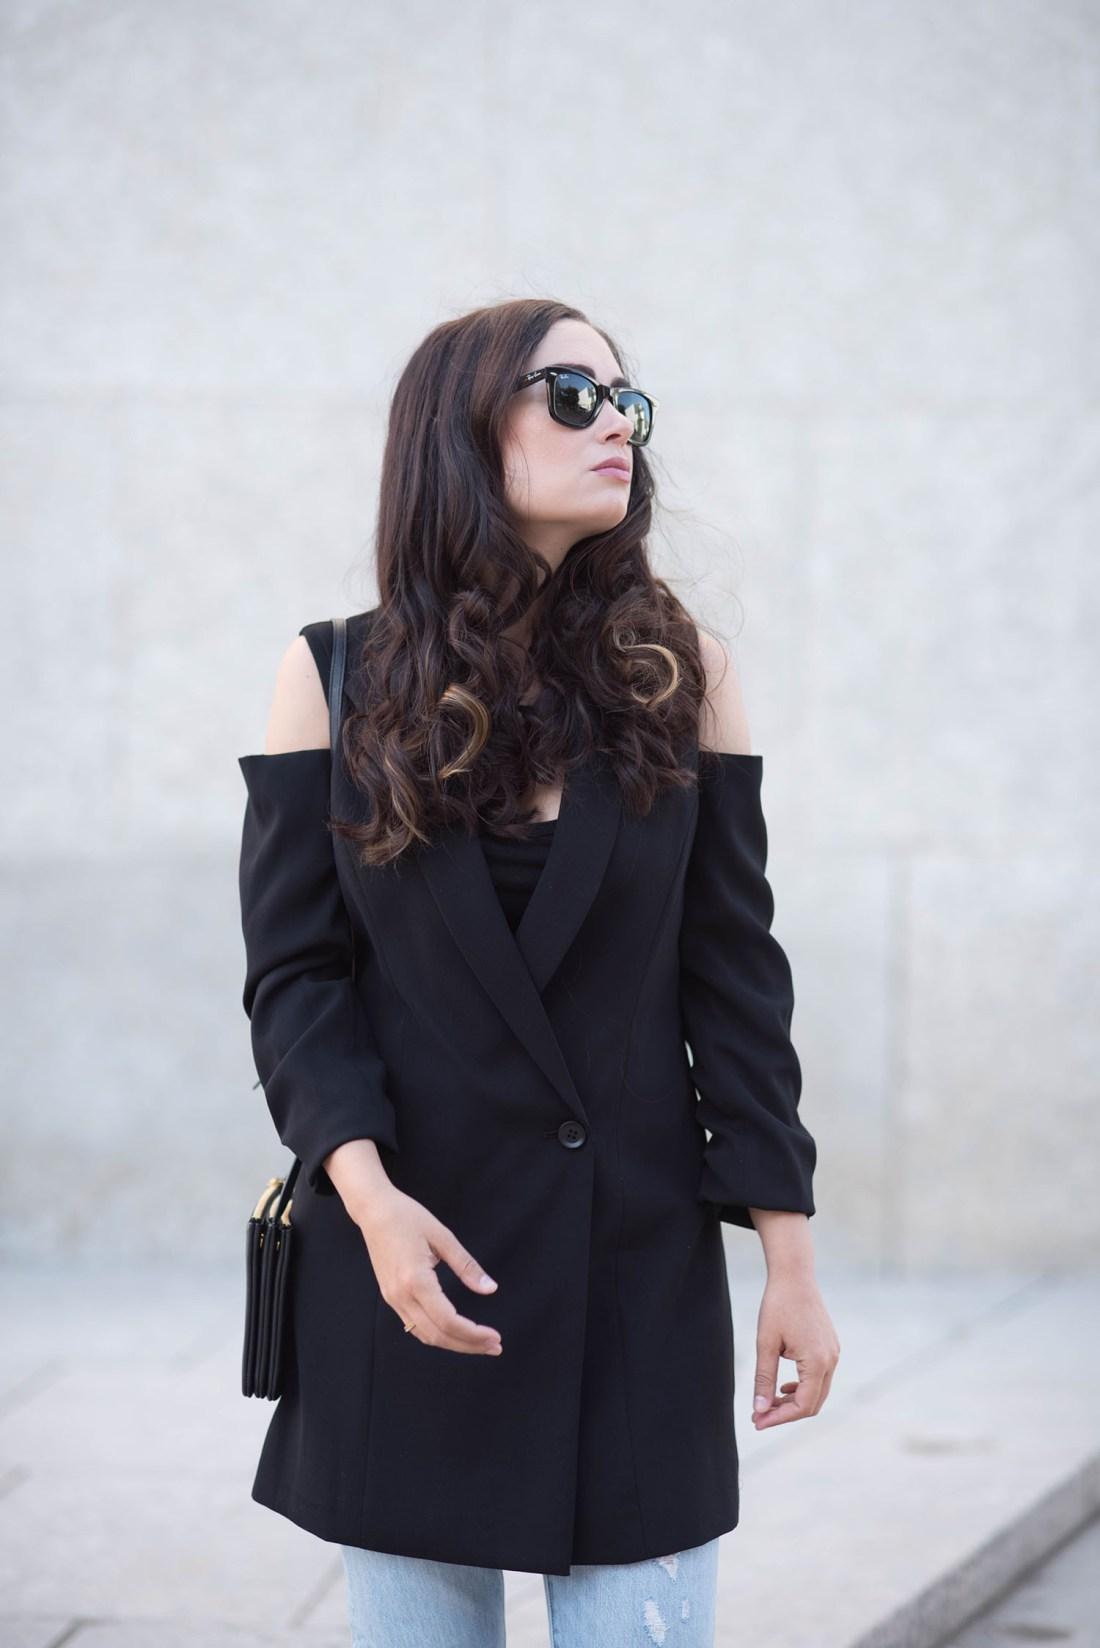 Portrait of brunette style blogger Cee Fardoe of Coco & Vera, wearing Ray Ban Wayfarer sunglasses